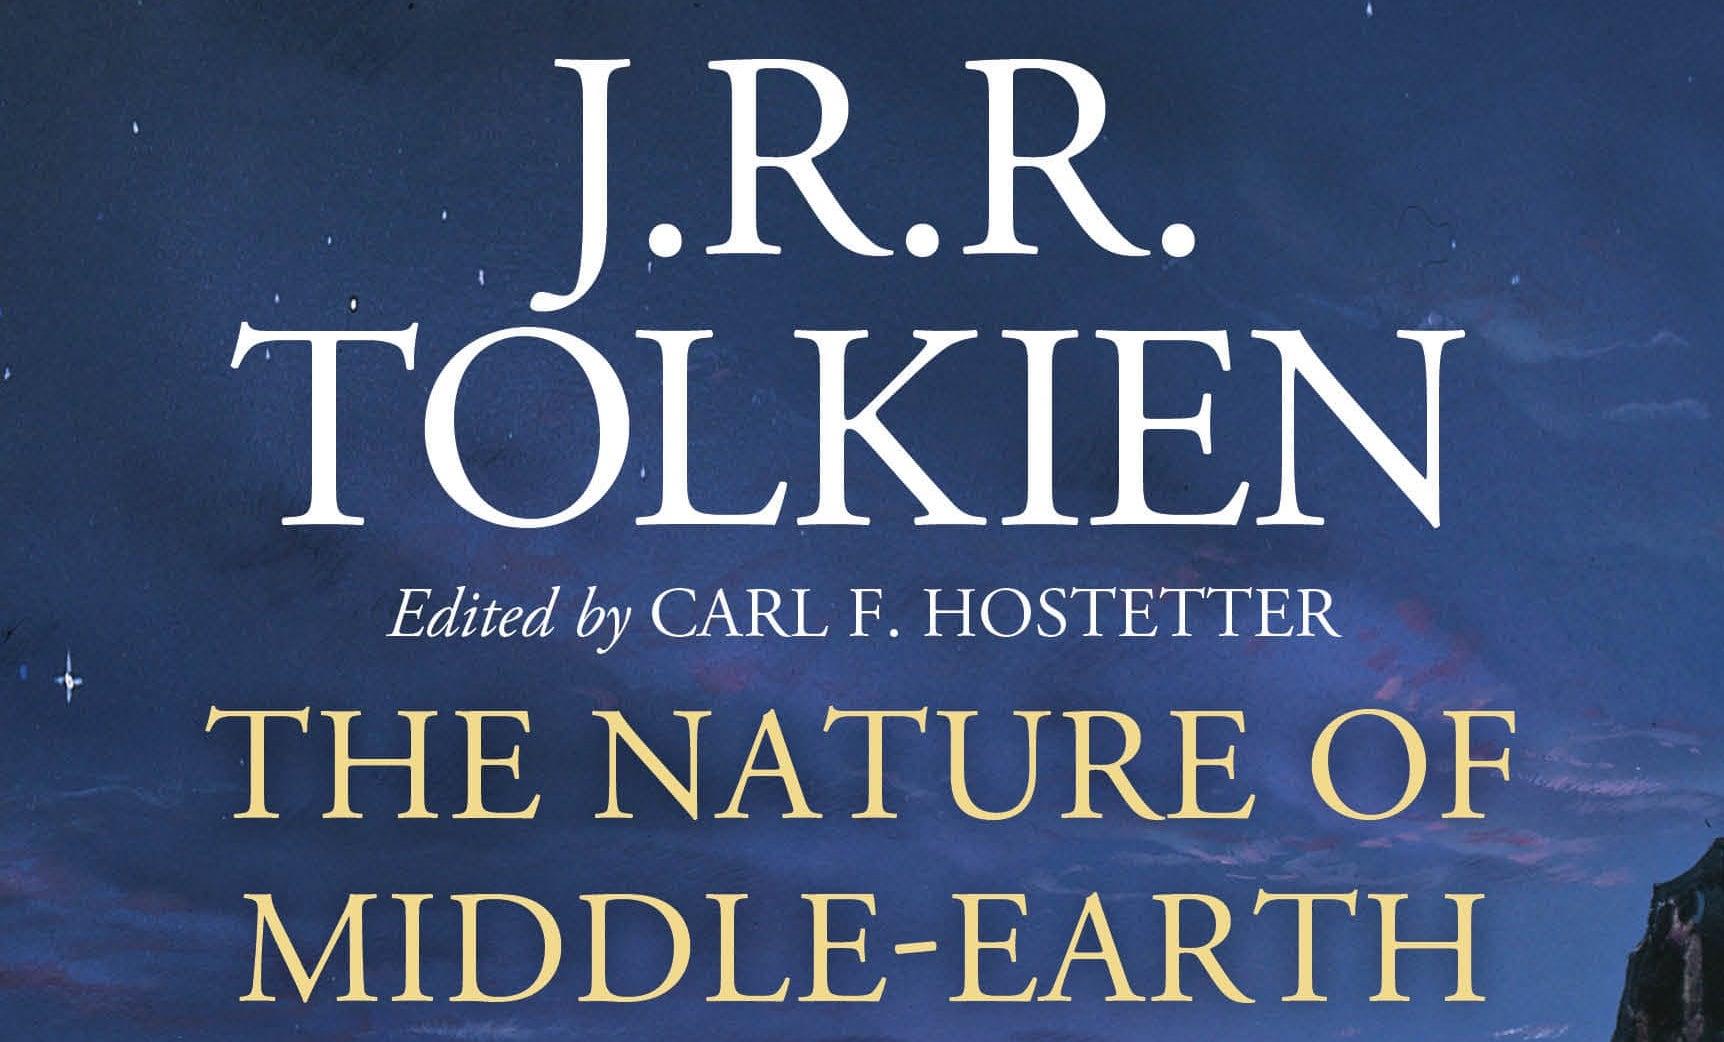 la naturaleza de la tierra media tolkien